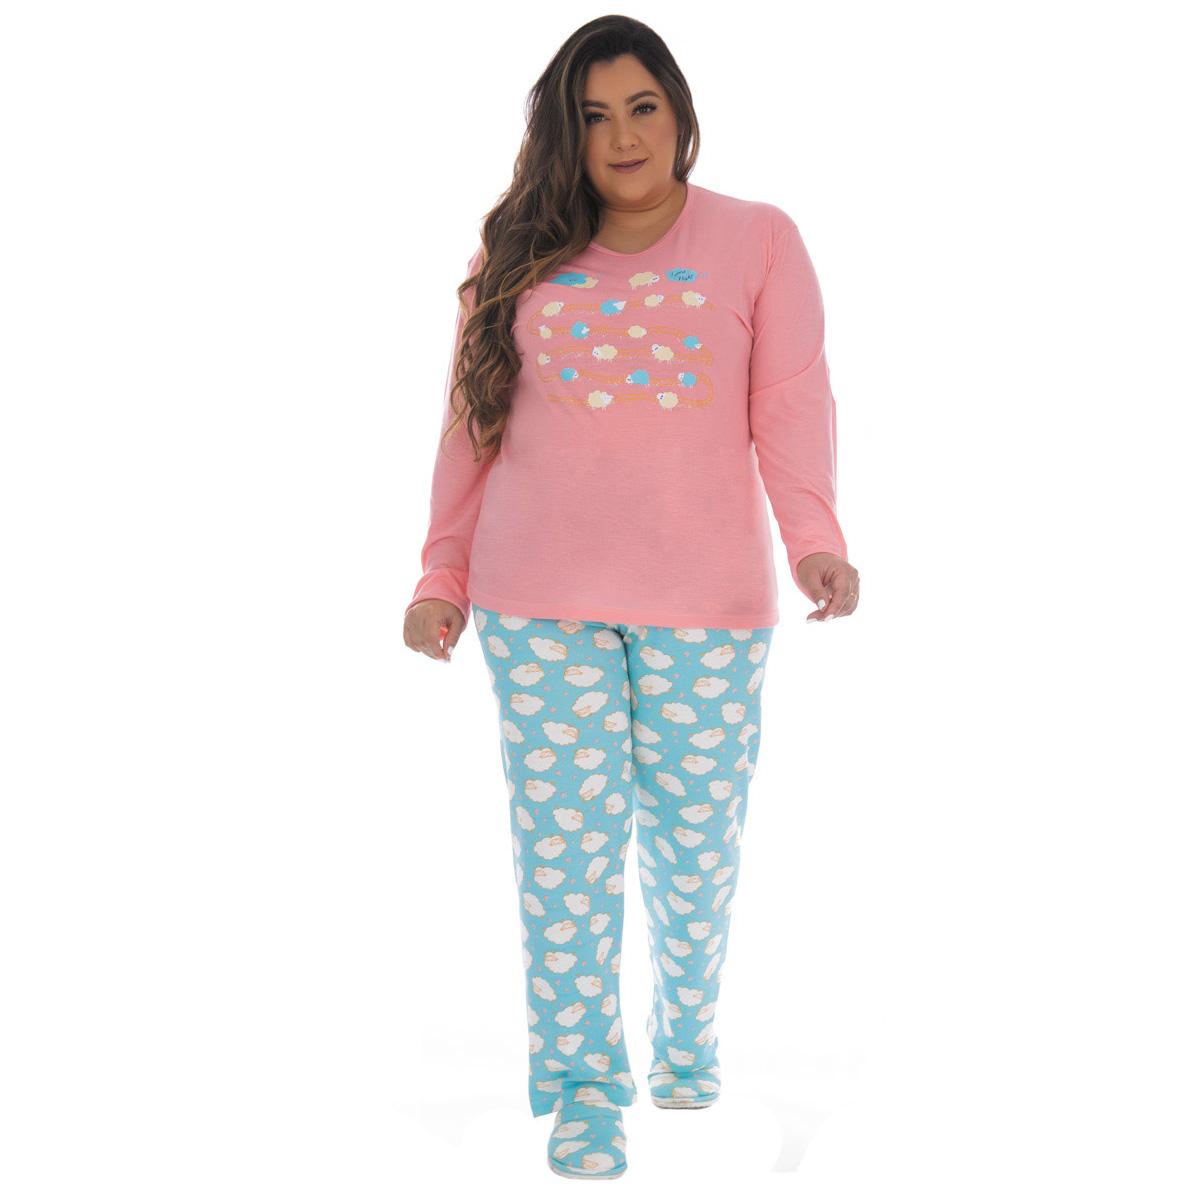 Pijama PLUS SIZE feminino de inverno PV especial Victory